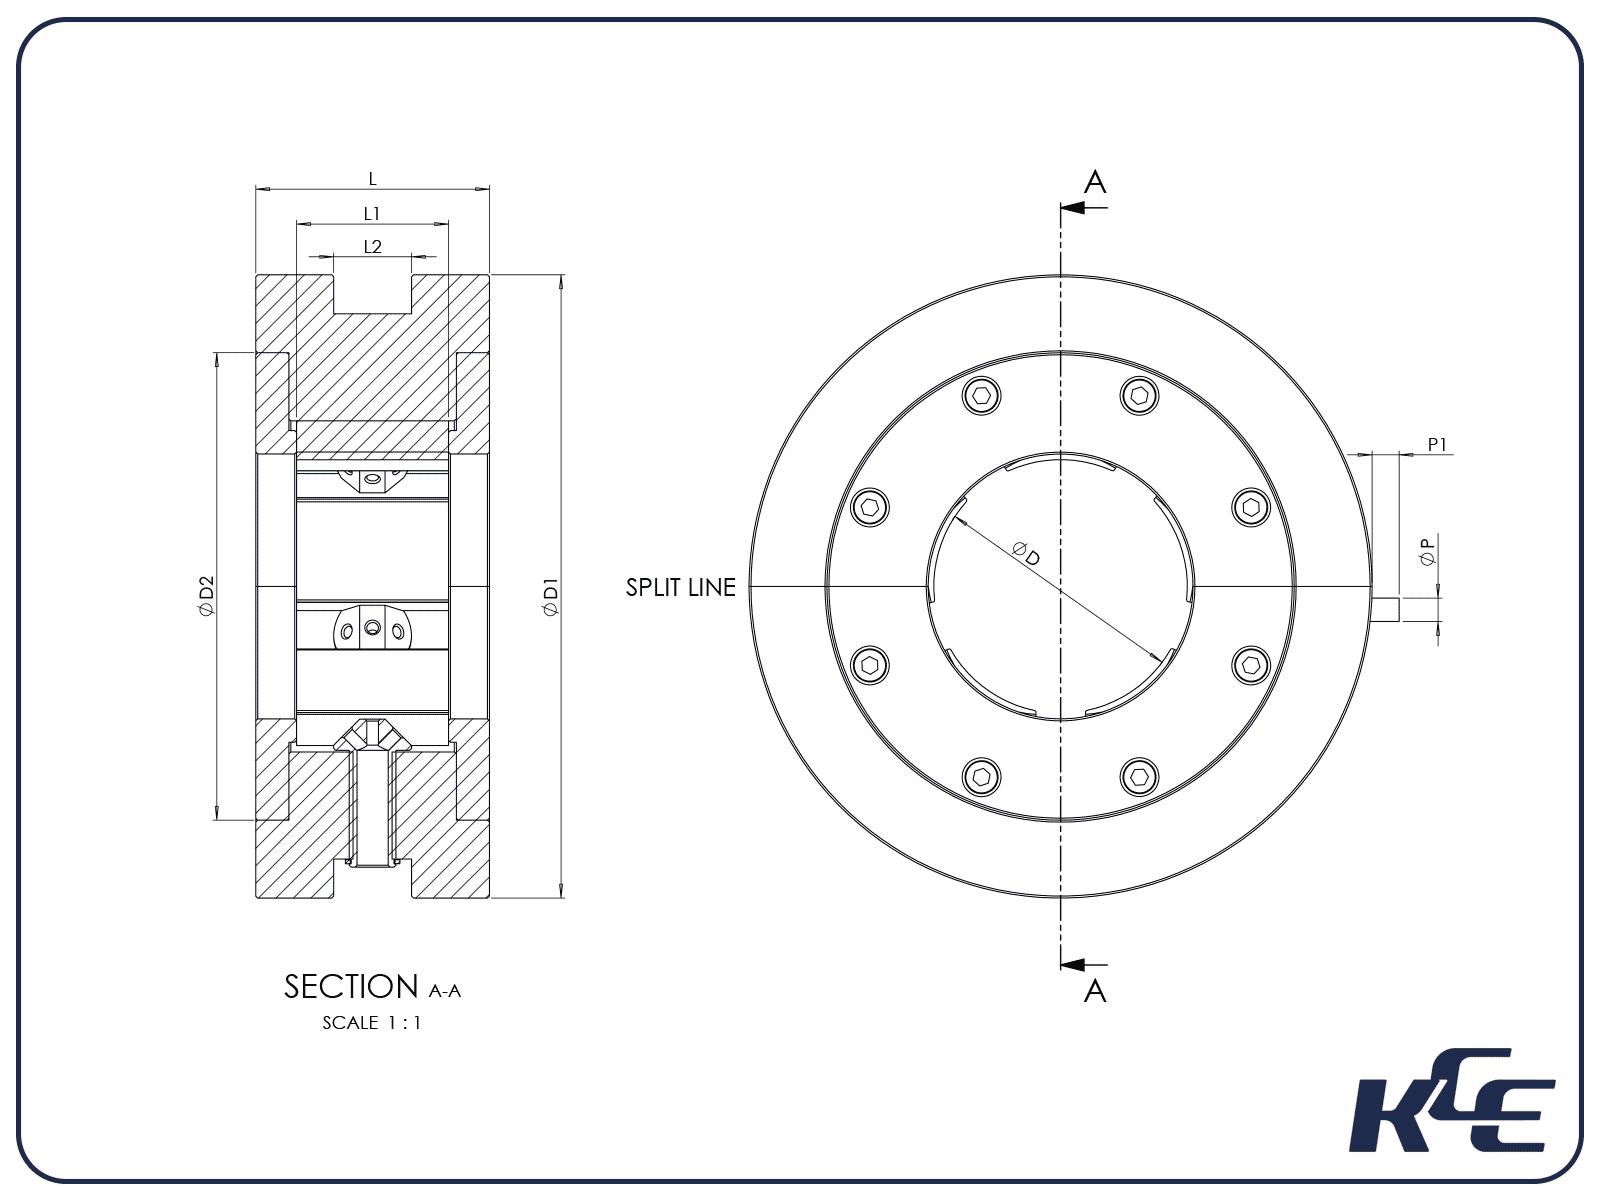 Tilt Pad Journal Bearing - T Series